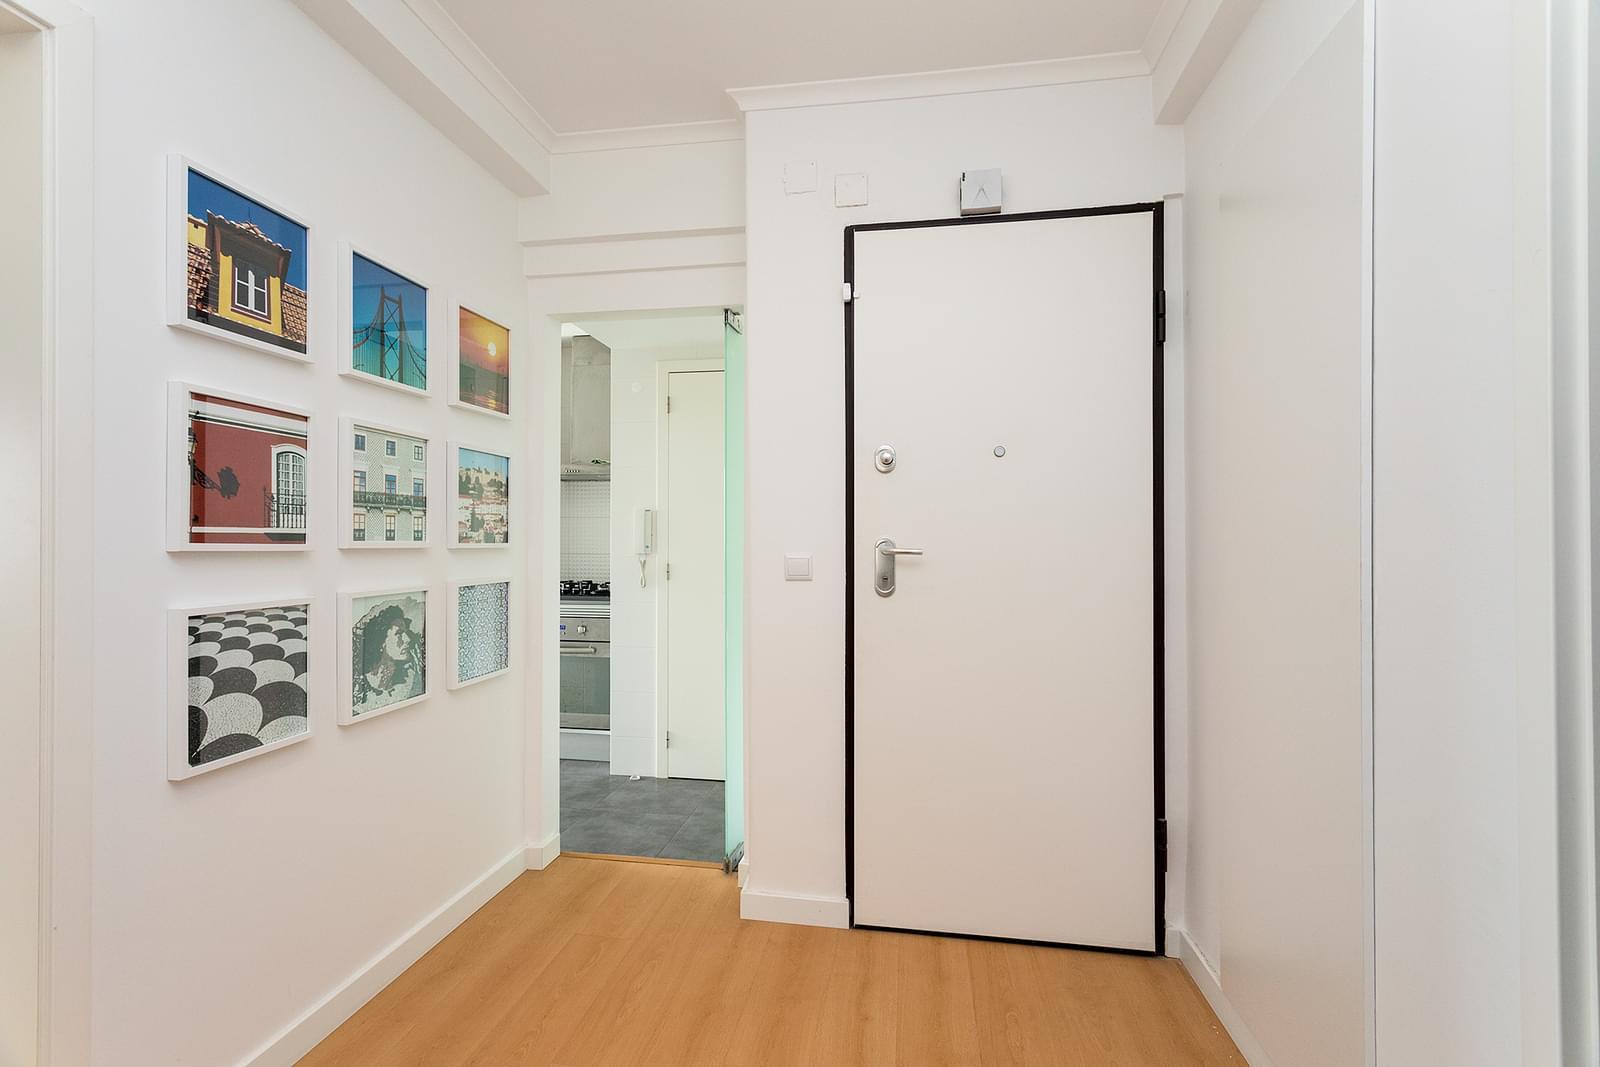 pf17340-apartamento-t3-lisboa-39ec83ed-e4fd-4bf8-a8a6-3ebd9b24bbb8